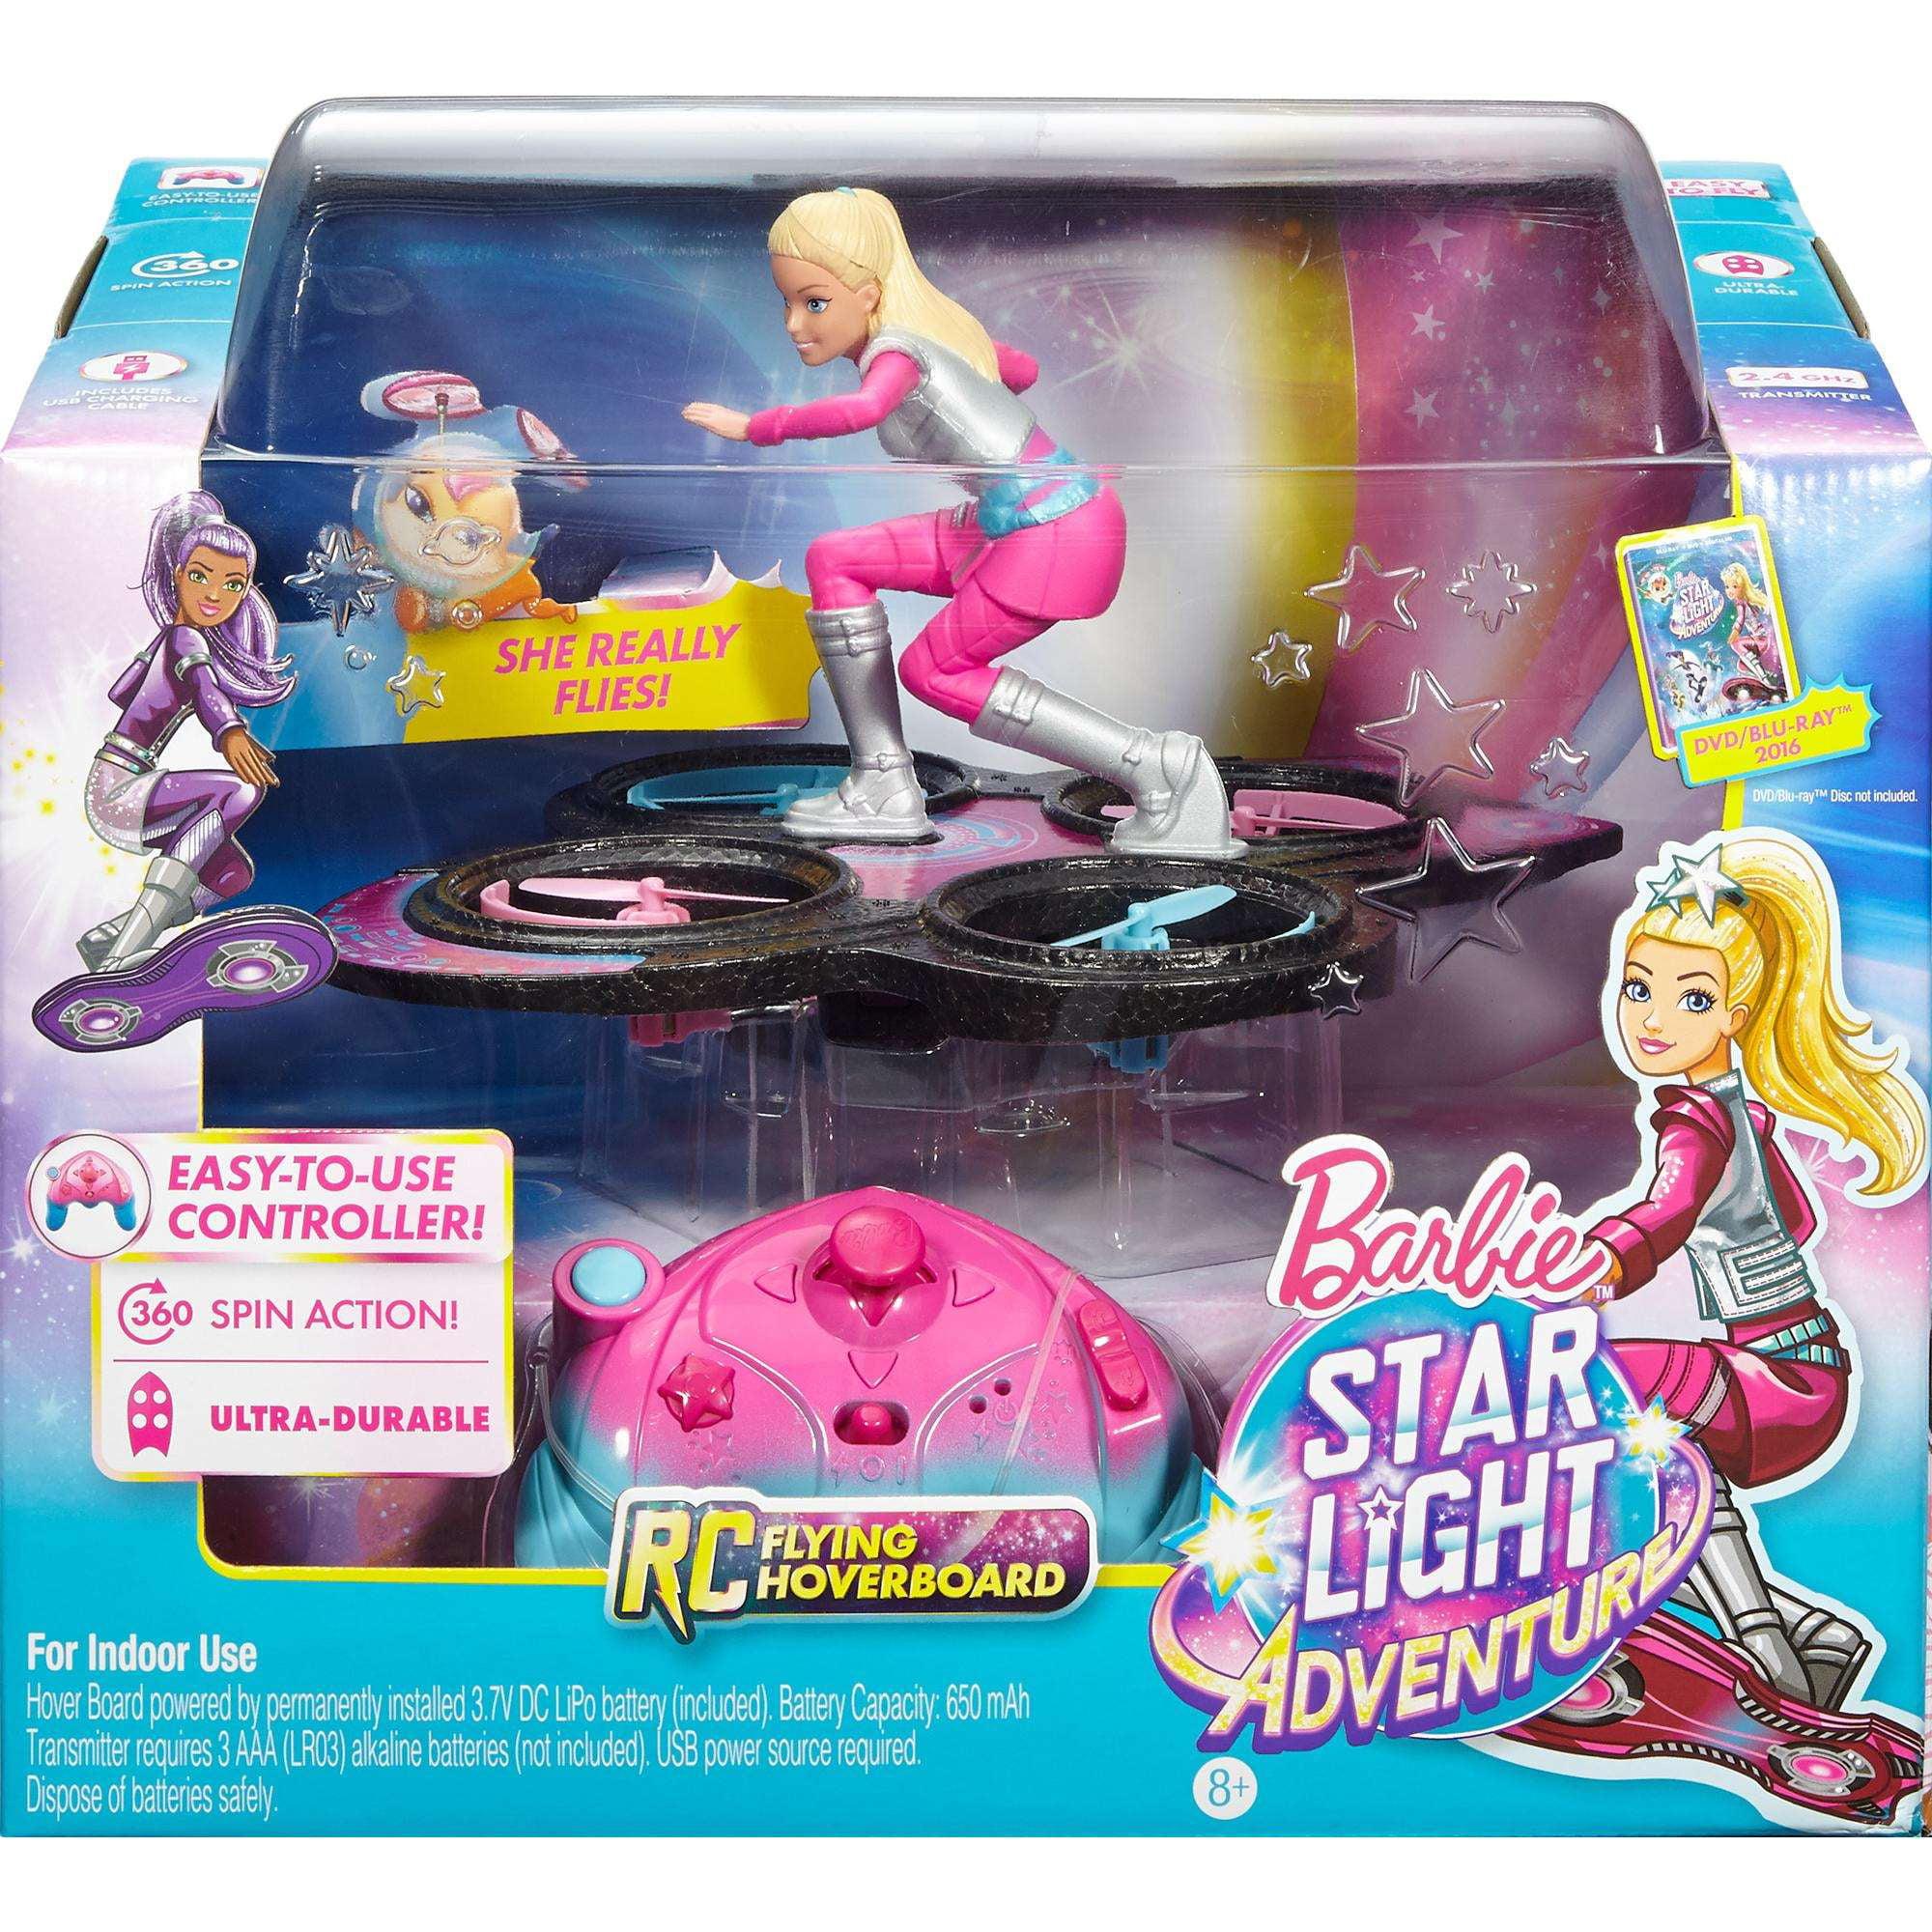 Barbie Star Light Adventure Flying RC Hoverboard - Walmart.com